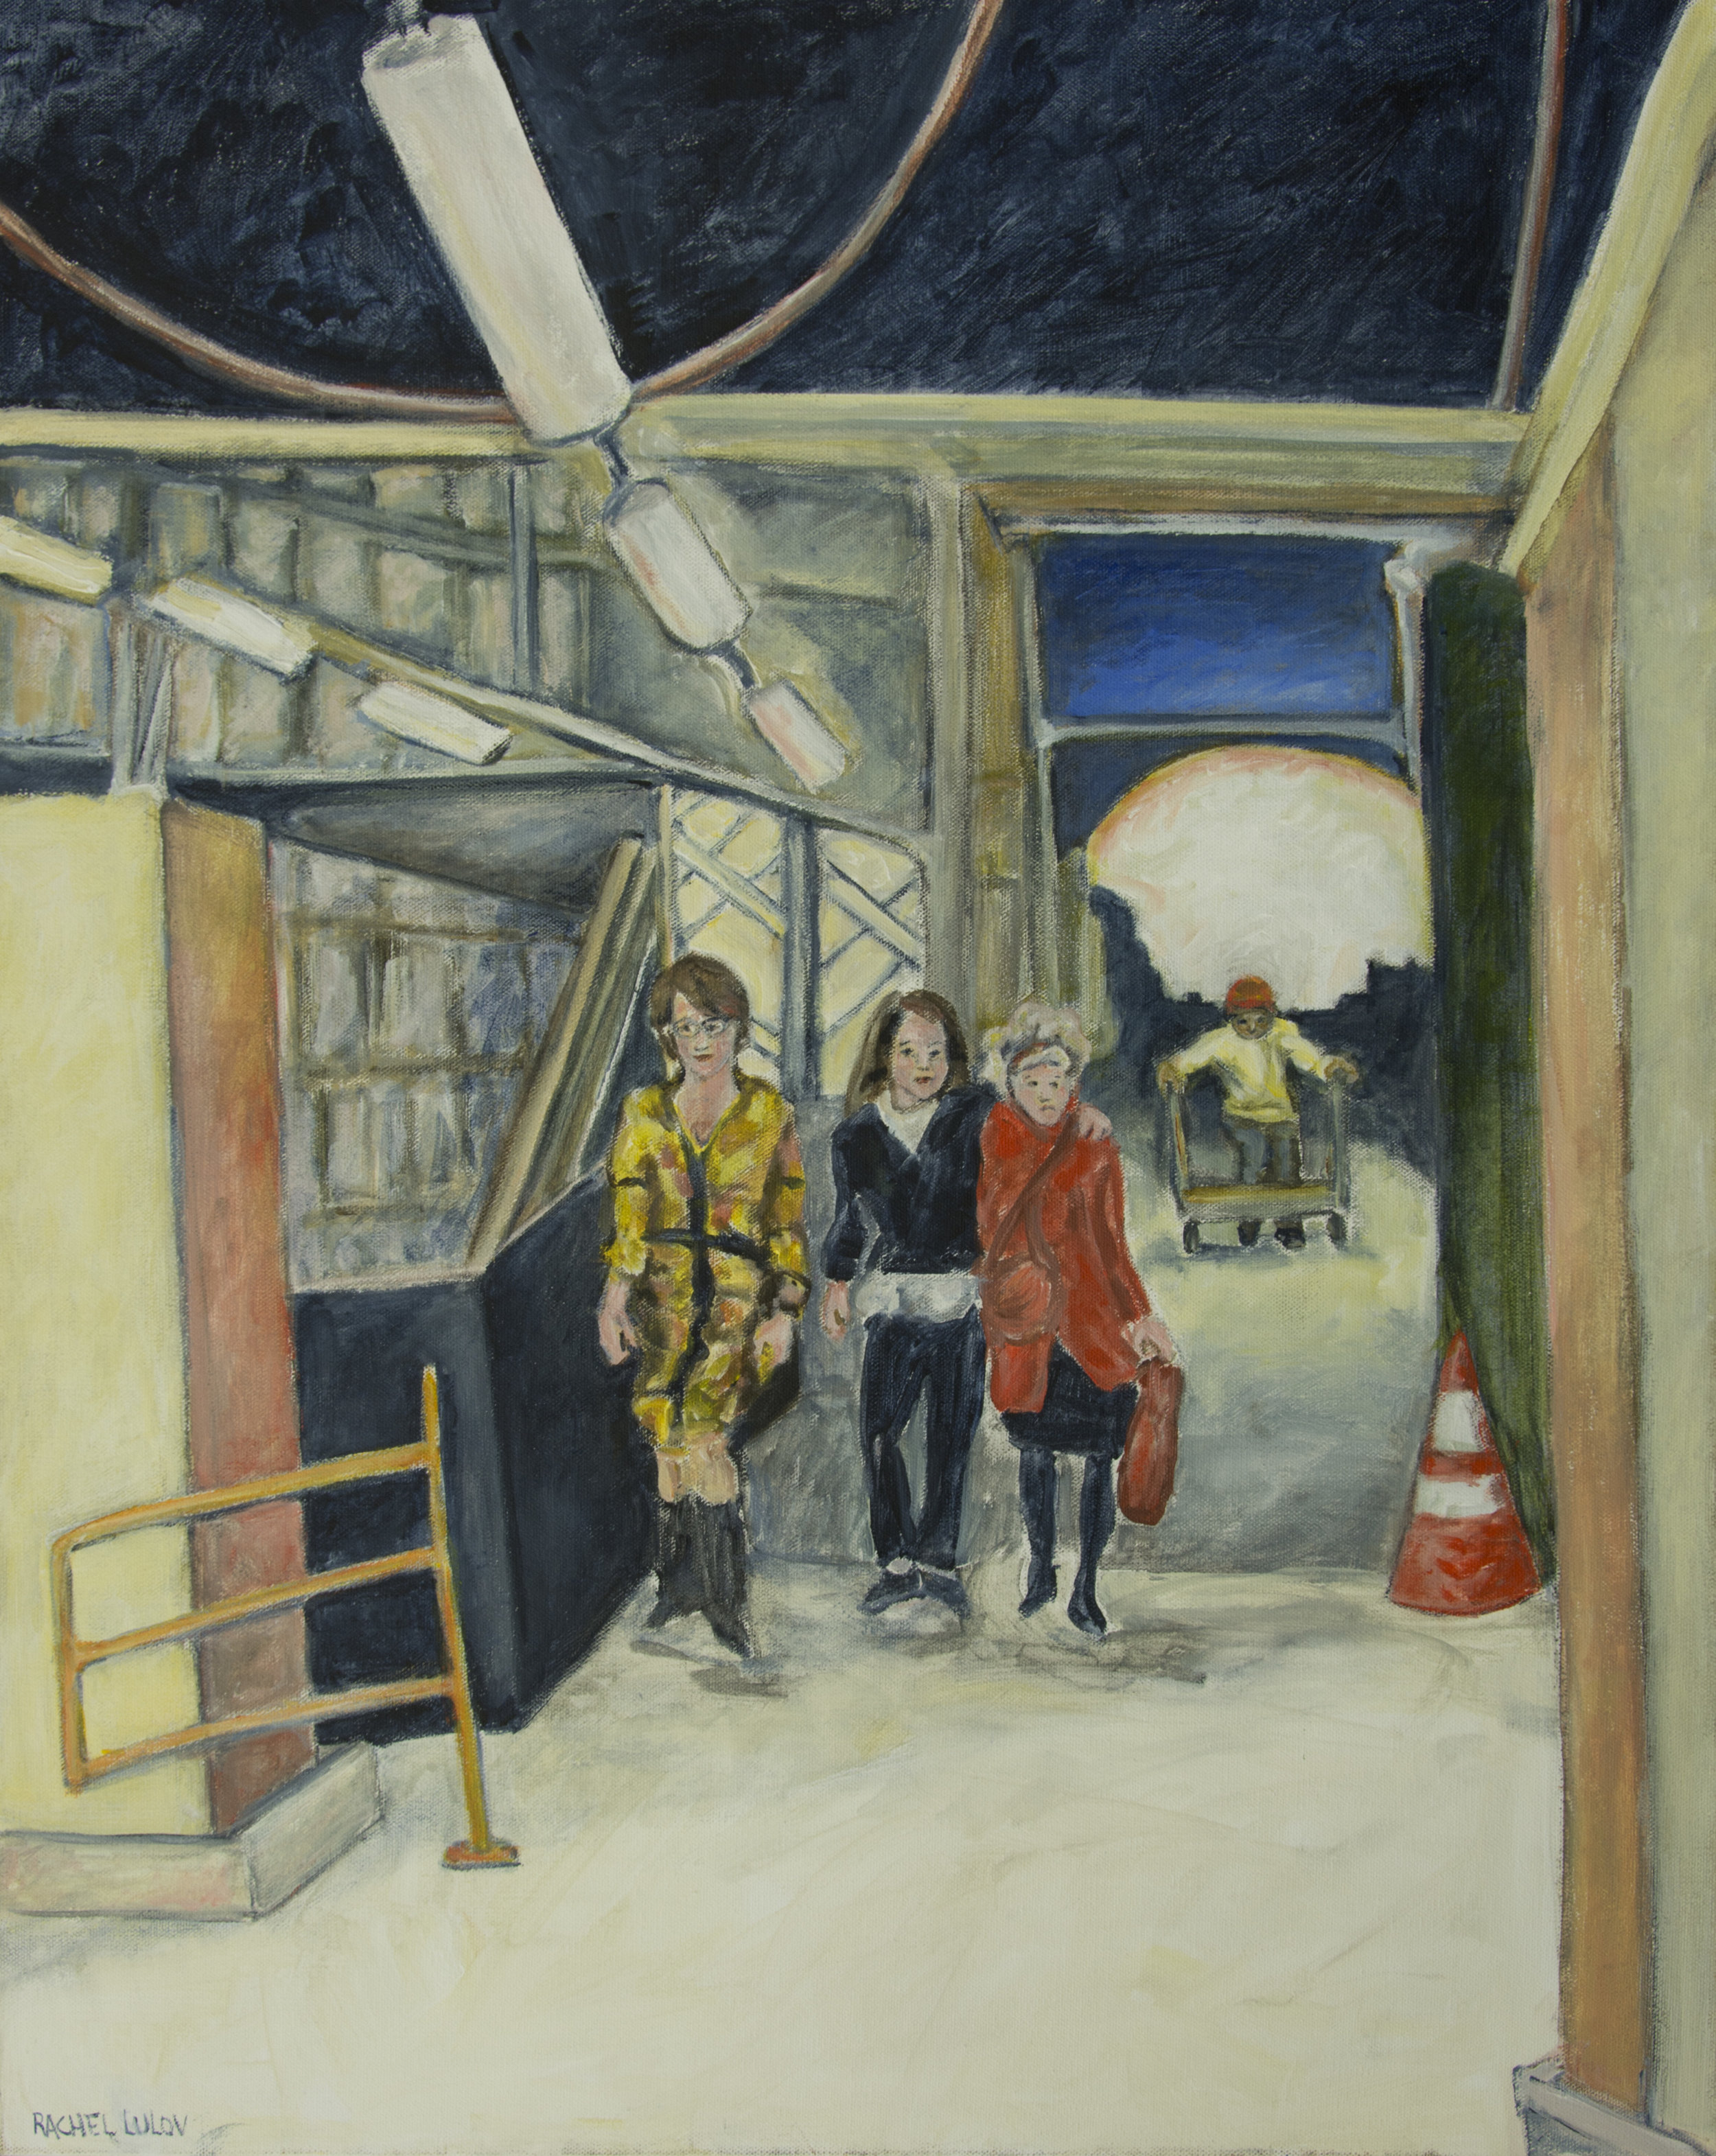 "Just Passing Through acrylic on Canvas 24"" x 30"" Rachel Lulov Segall"